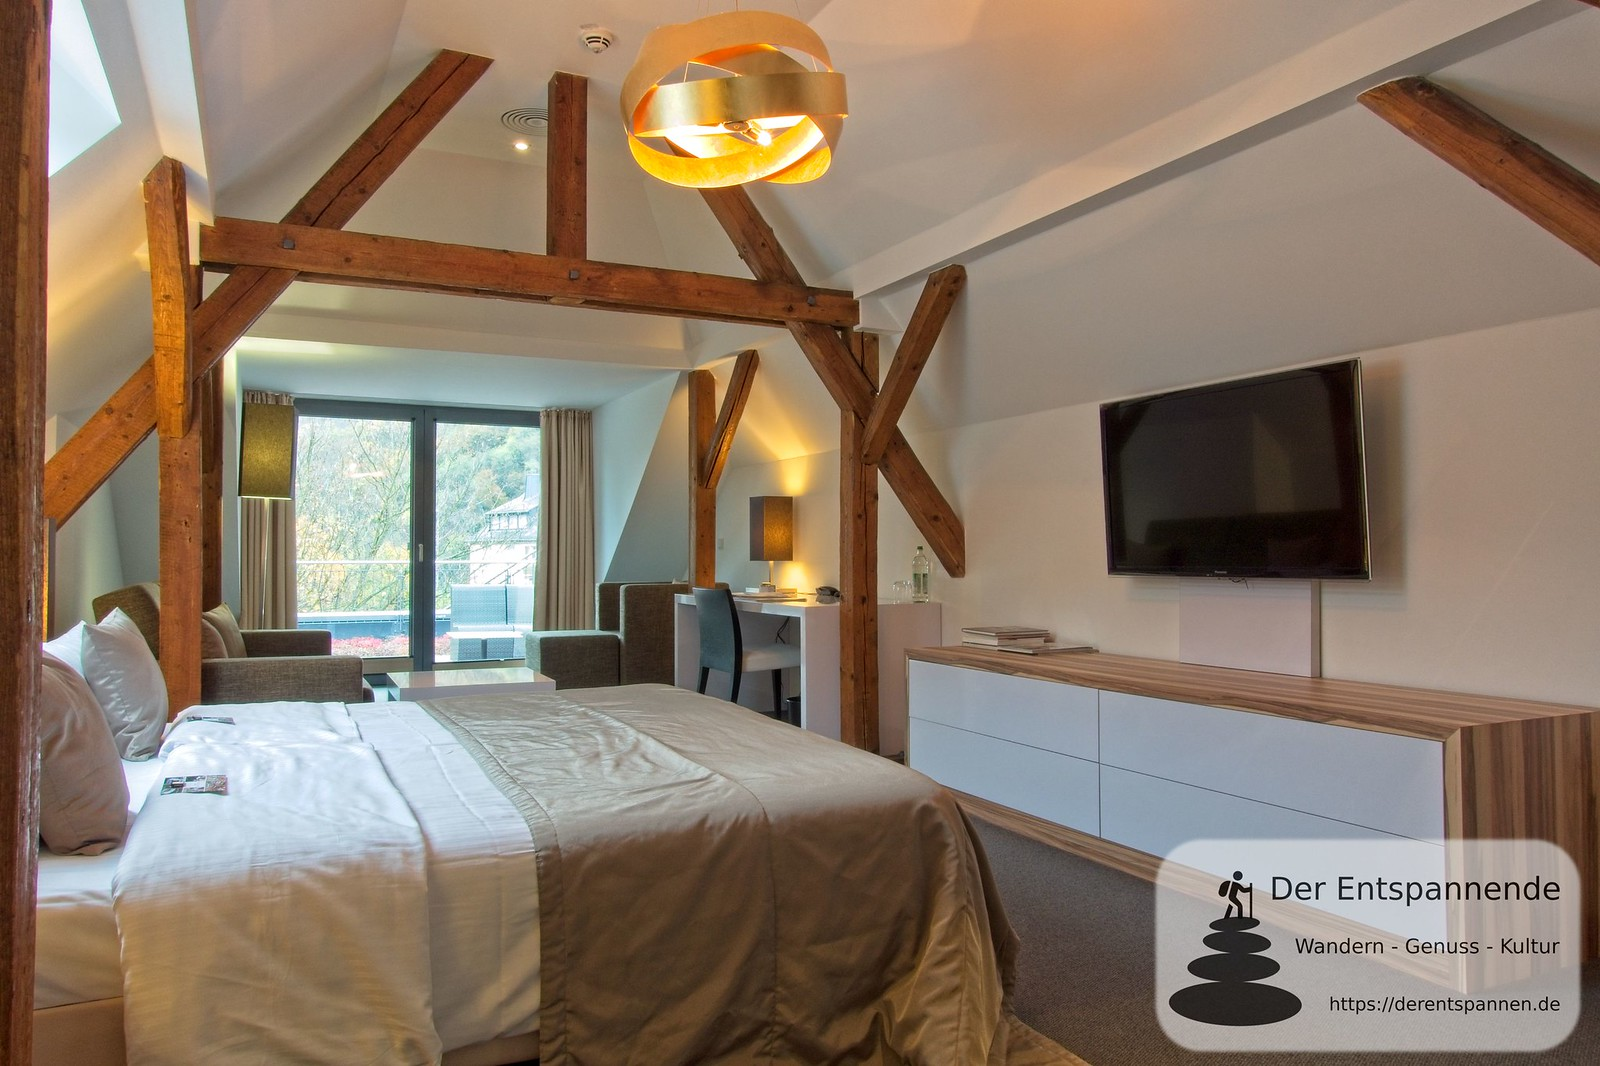 Penthouse-Suite im Hotel im Schulhaus (Lorch)